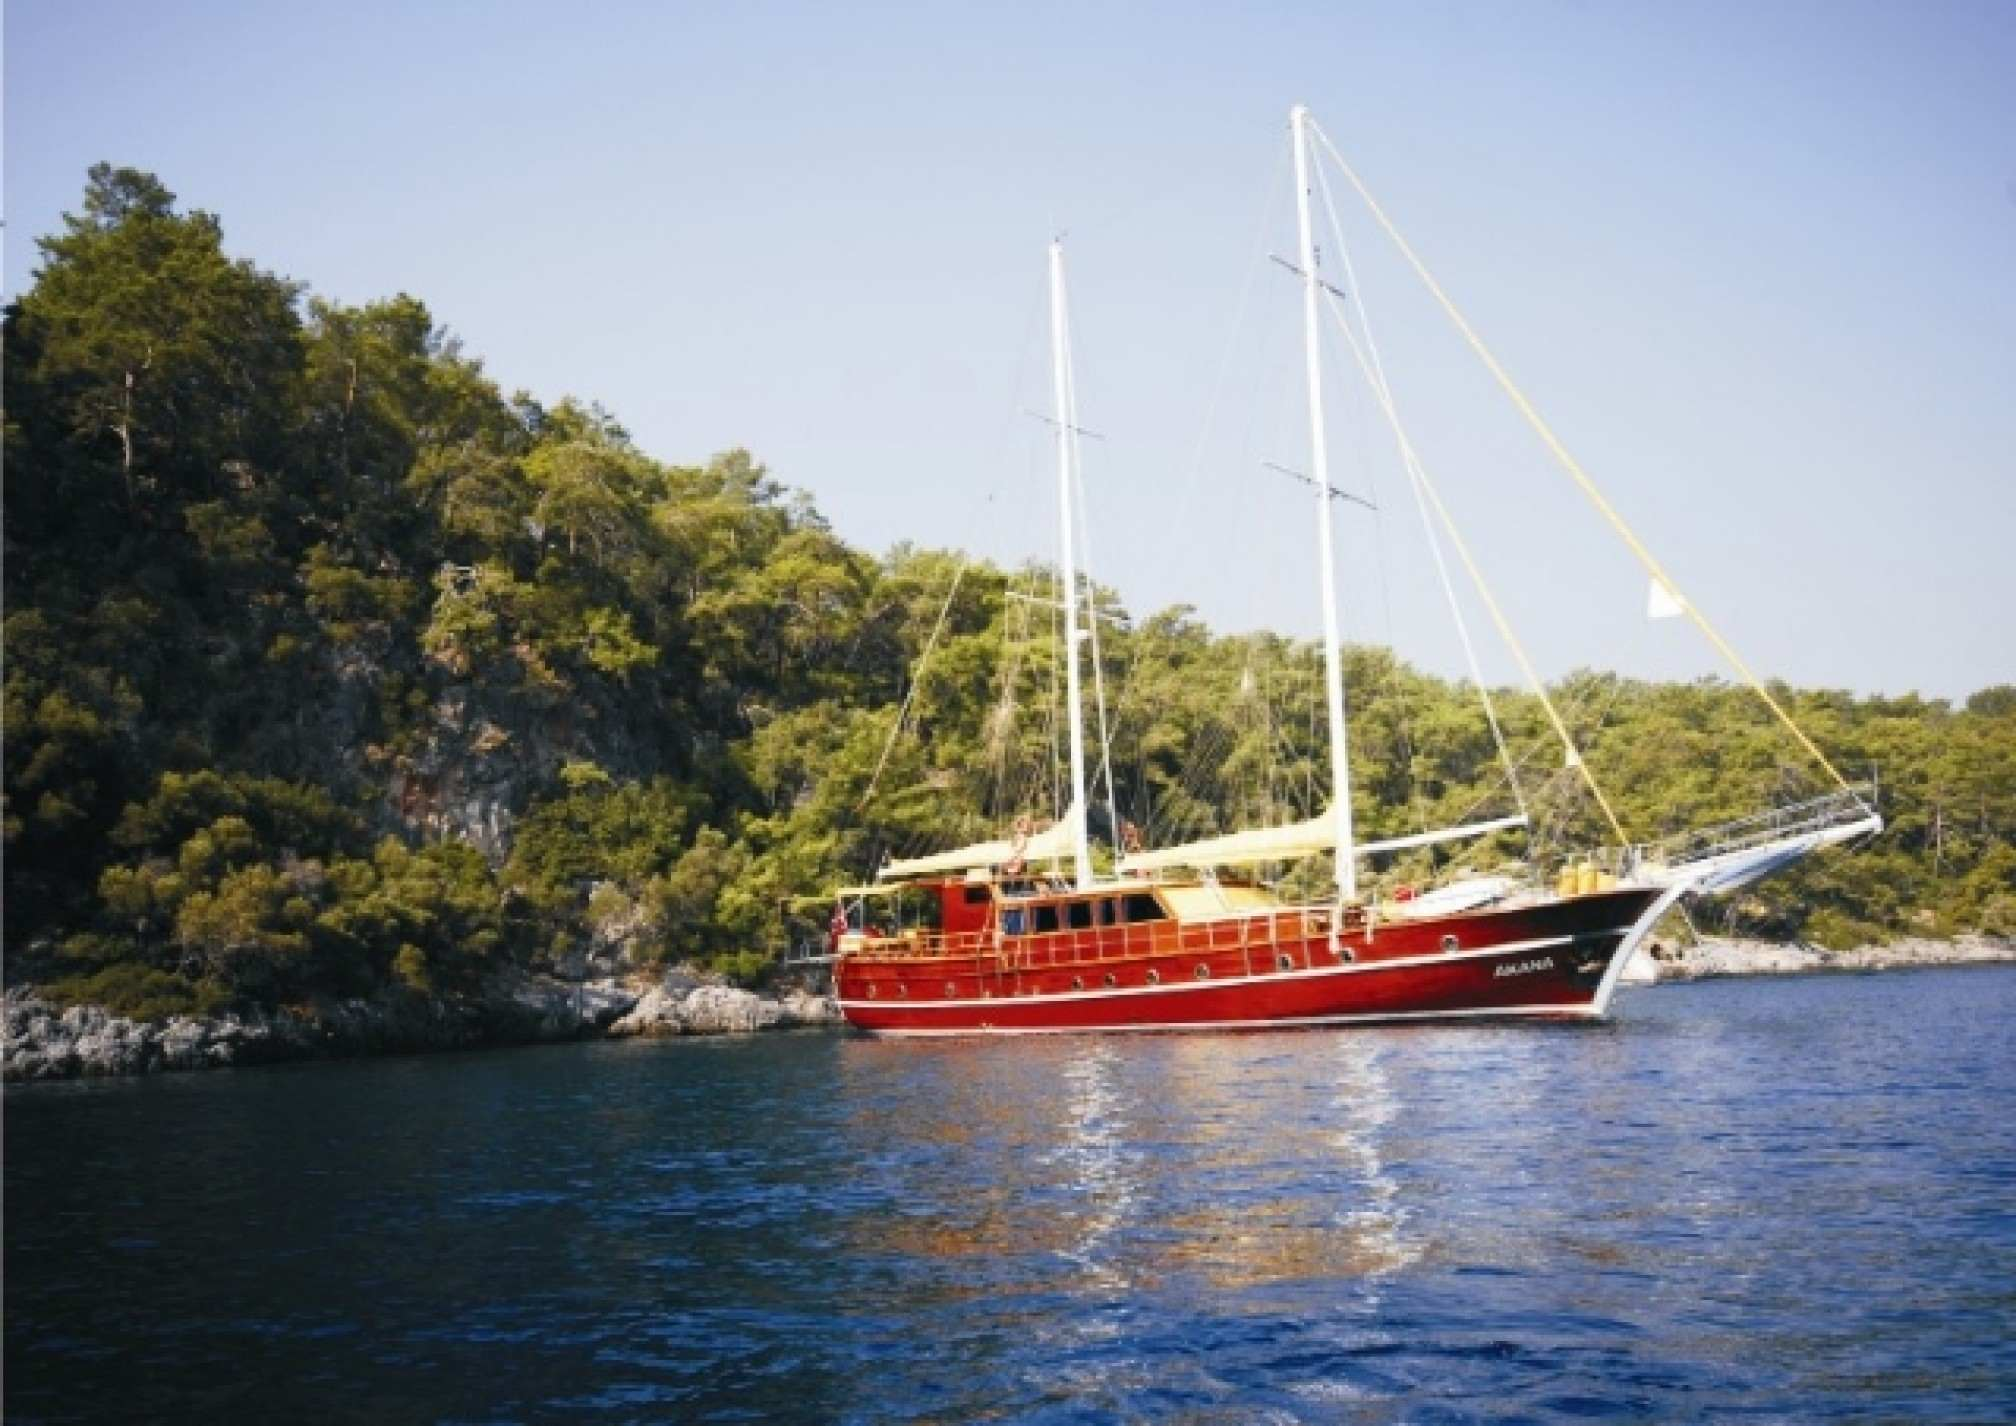 Akana 14 pax en Grecia, Turquía